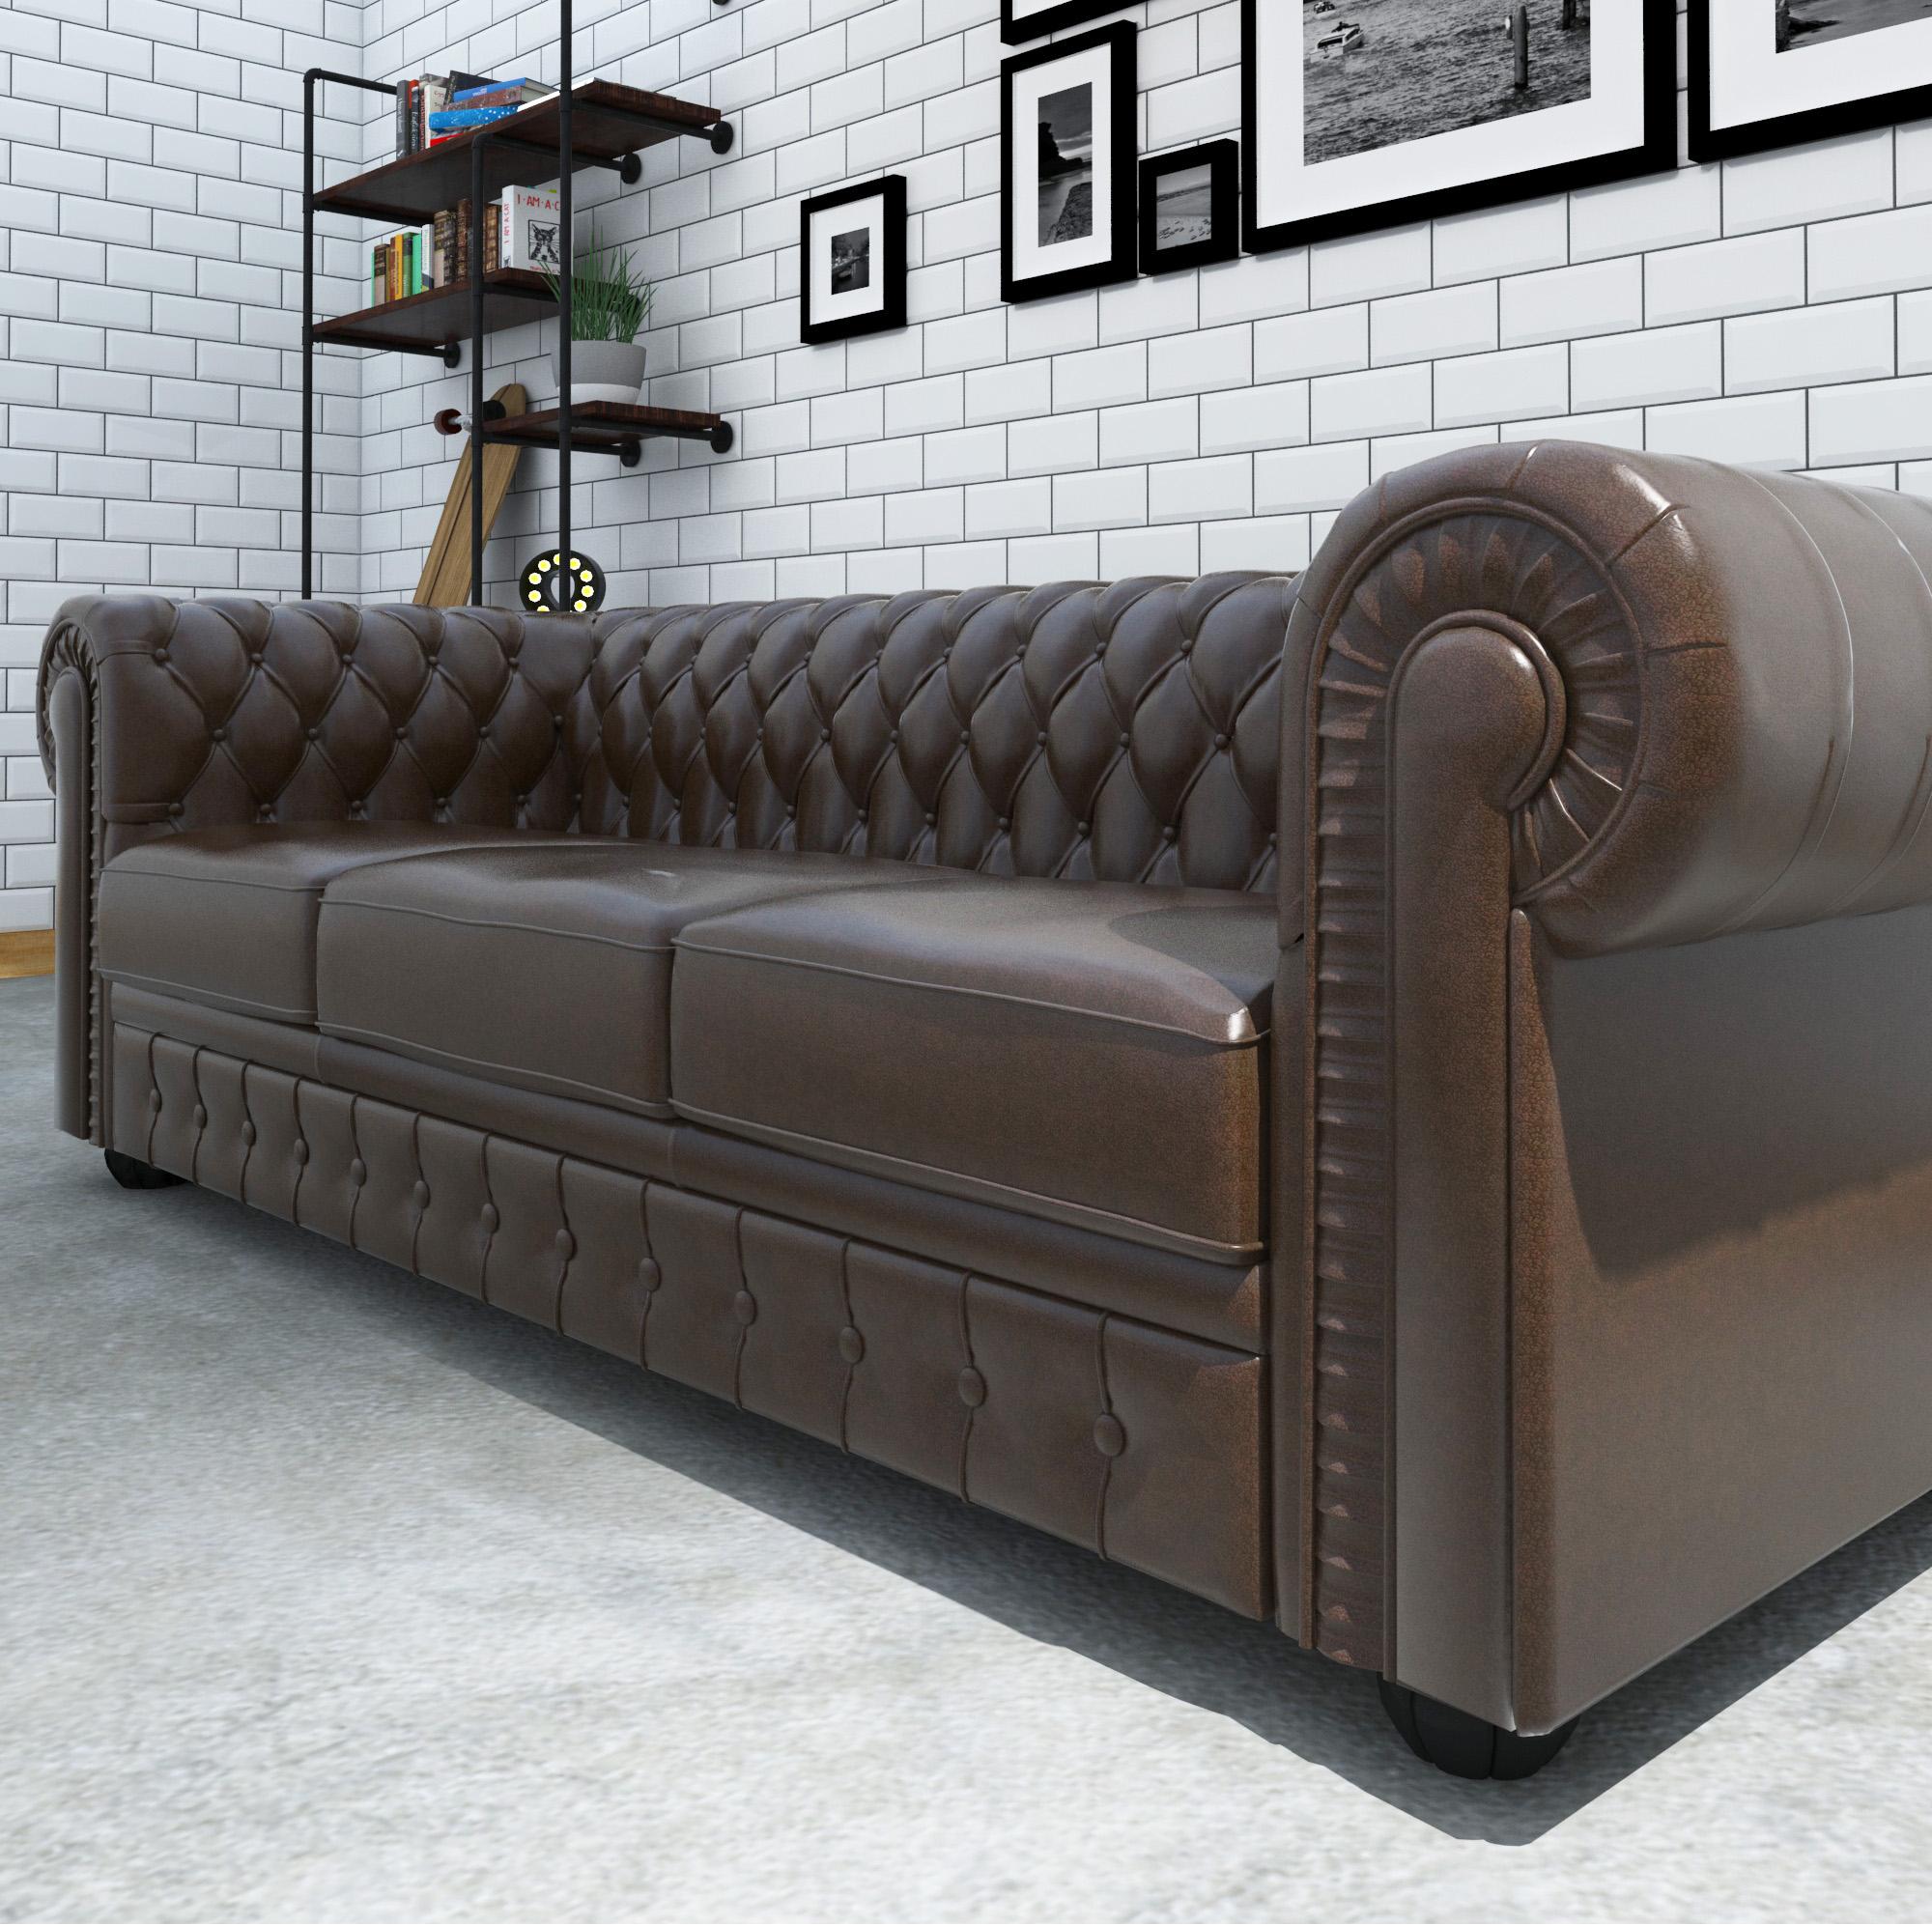 Full Size of Chesterfield Sofa By Nobrandstudio Rund Antik U Form Kolonialstil Kunstleder Big Sam Federkern Schilling Alternatives Reinigen Sofa Chesterfield Sofa